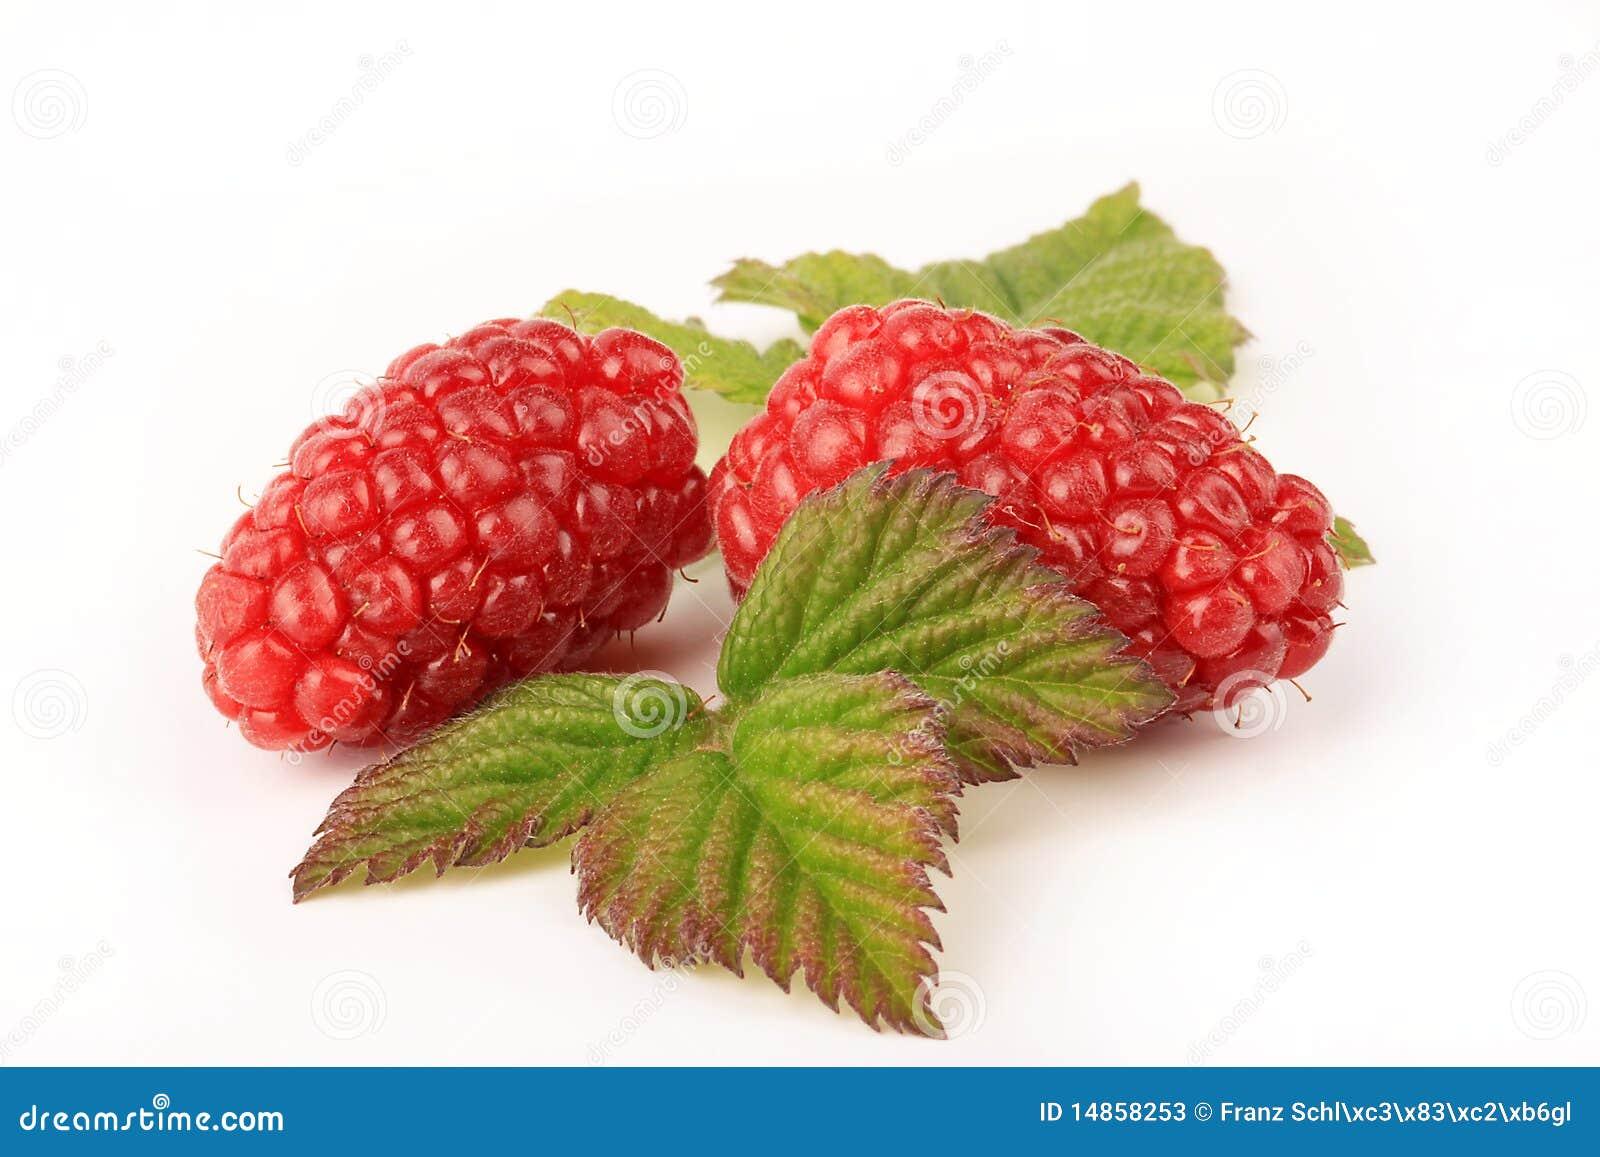 Ripe Tayberries